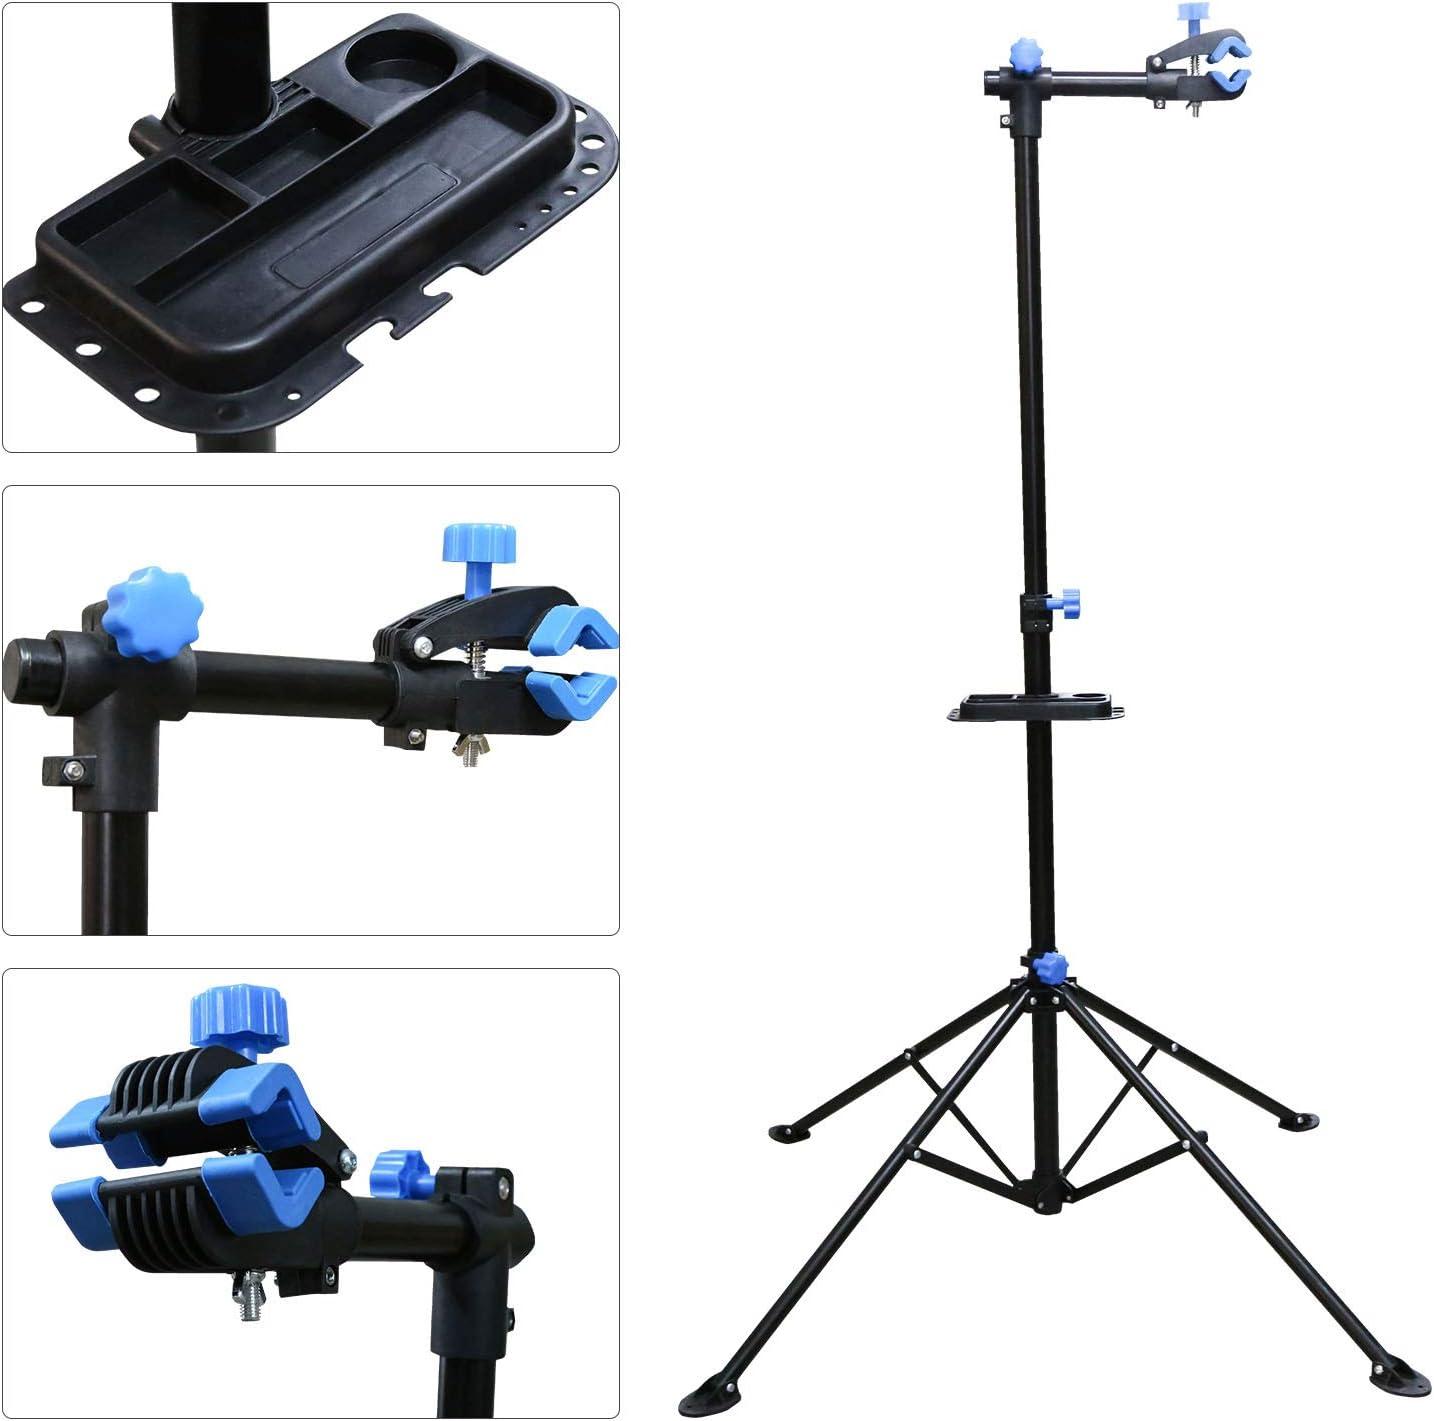 Hengda Bike Repair Stand Adjustable Bicycle Repair Workstand Portable up to 30KG,for Bike Maintenance,Black Lightweight